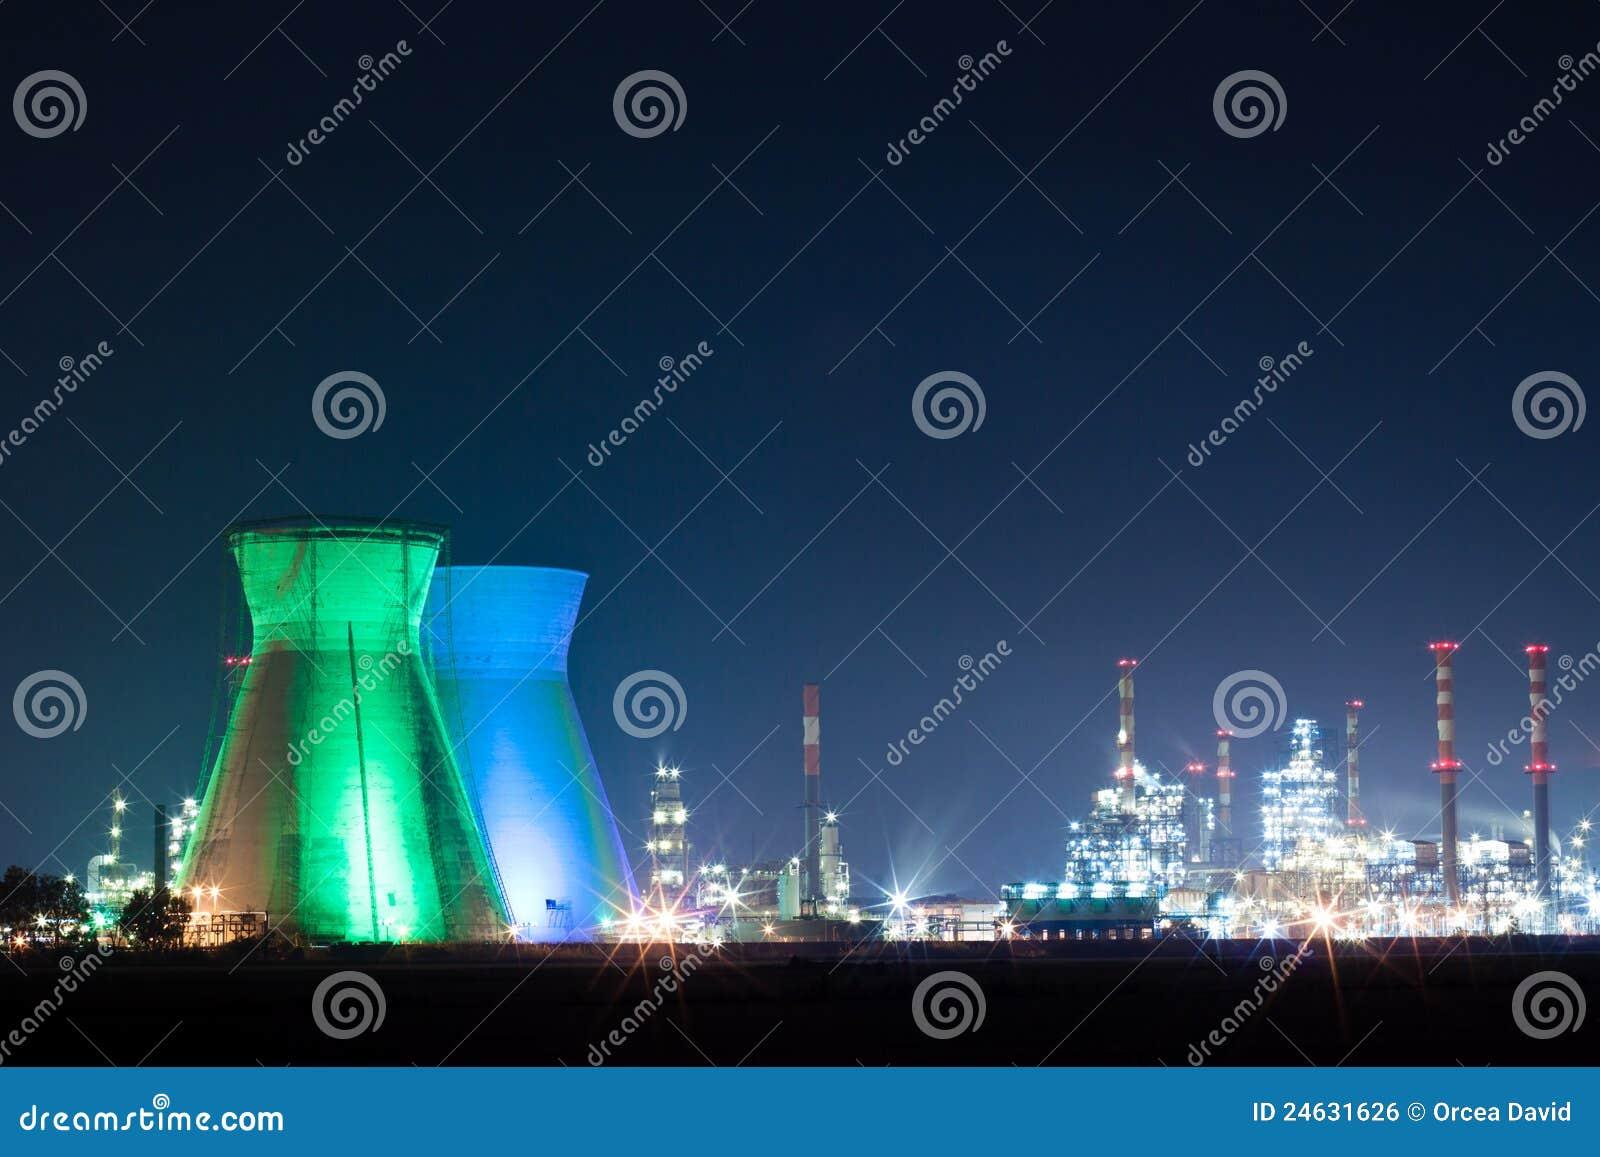 oil-refinery-24631626.jpg